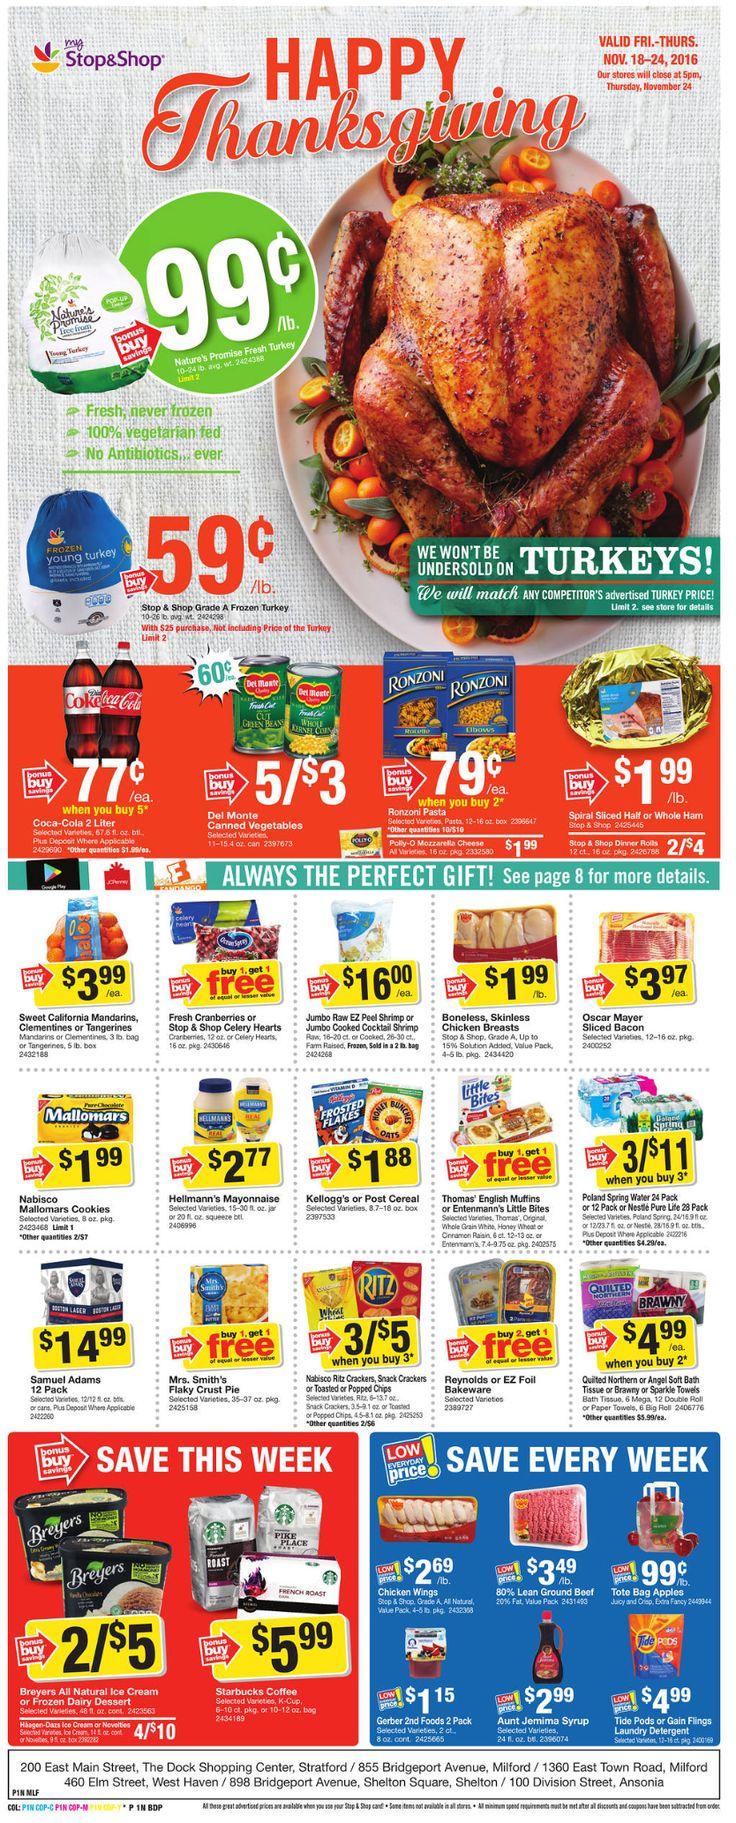 Stop and Shop Circular November 18 - 24, 2016 - http://www.olcatalog.com/grocery/stop-and-shop-circular.html